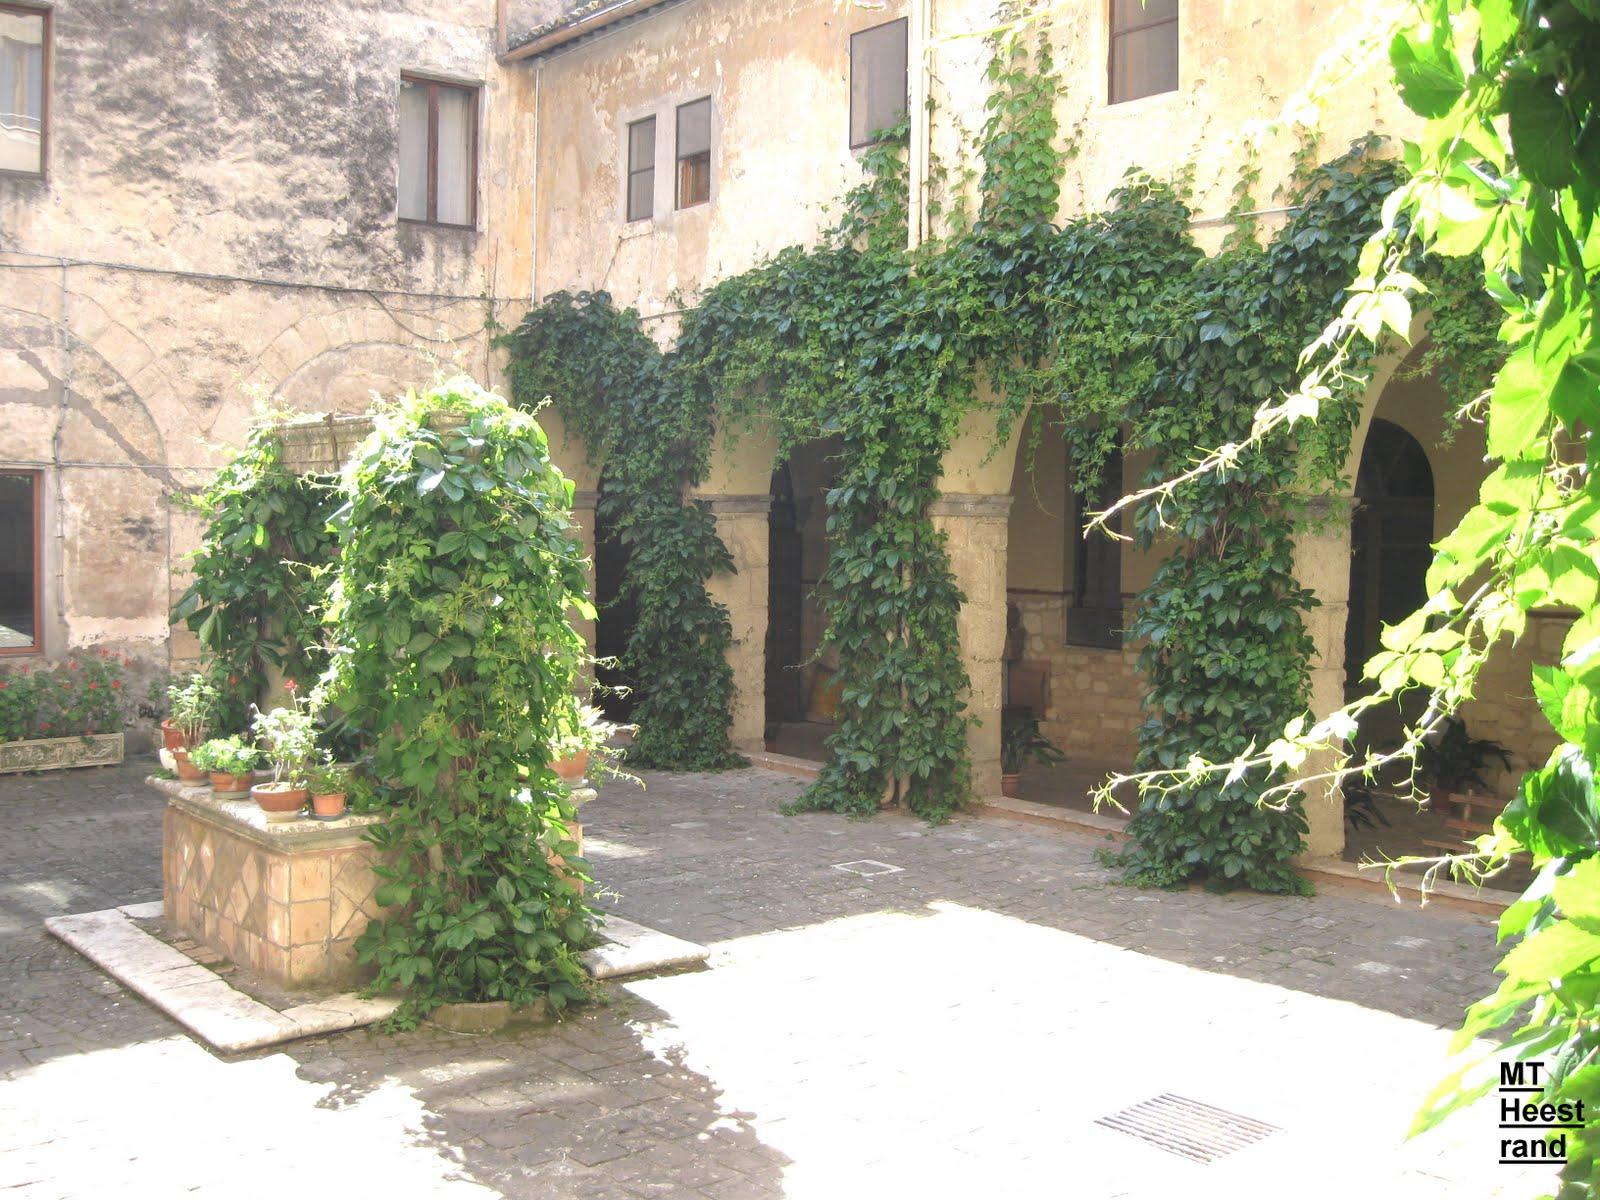 Mysiga Kok : lantlig tavla kok  Det mysiga Heestrand Hemkommen fron Italien